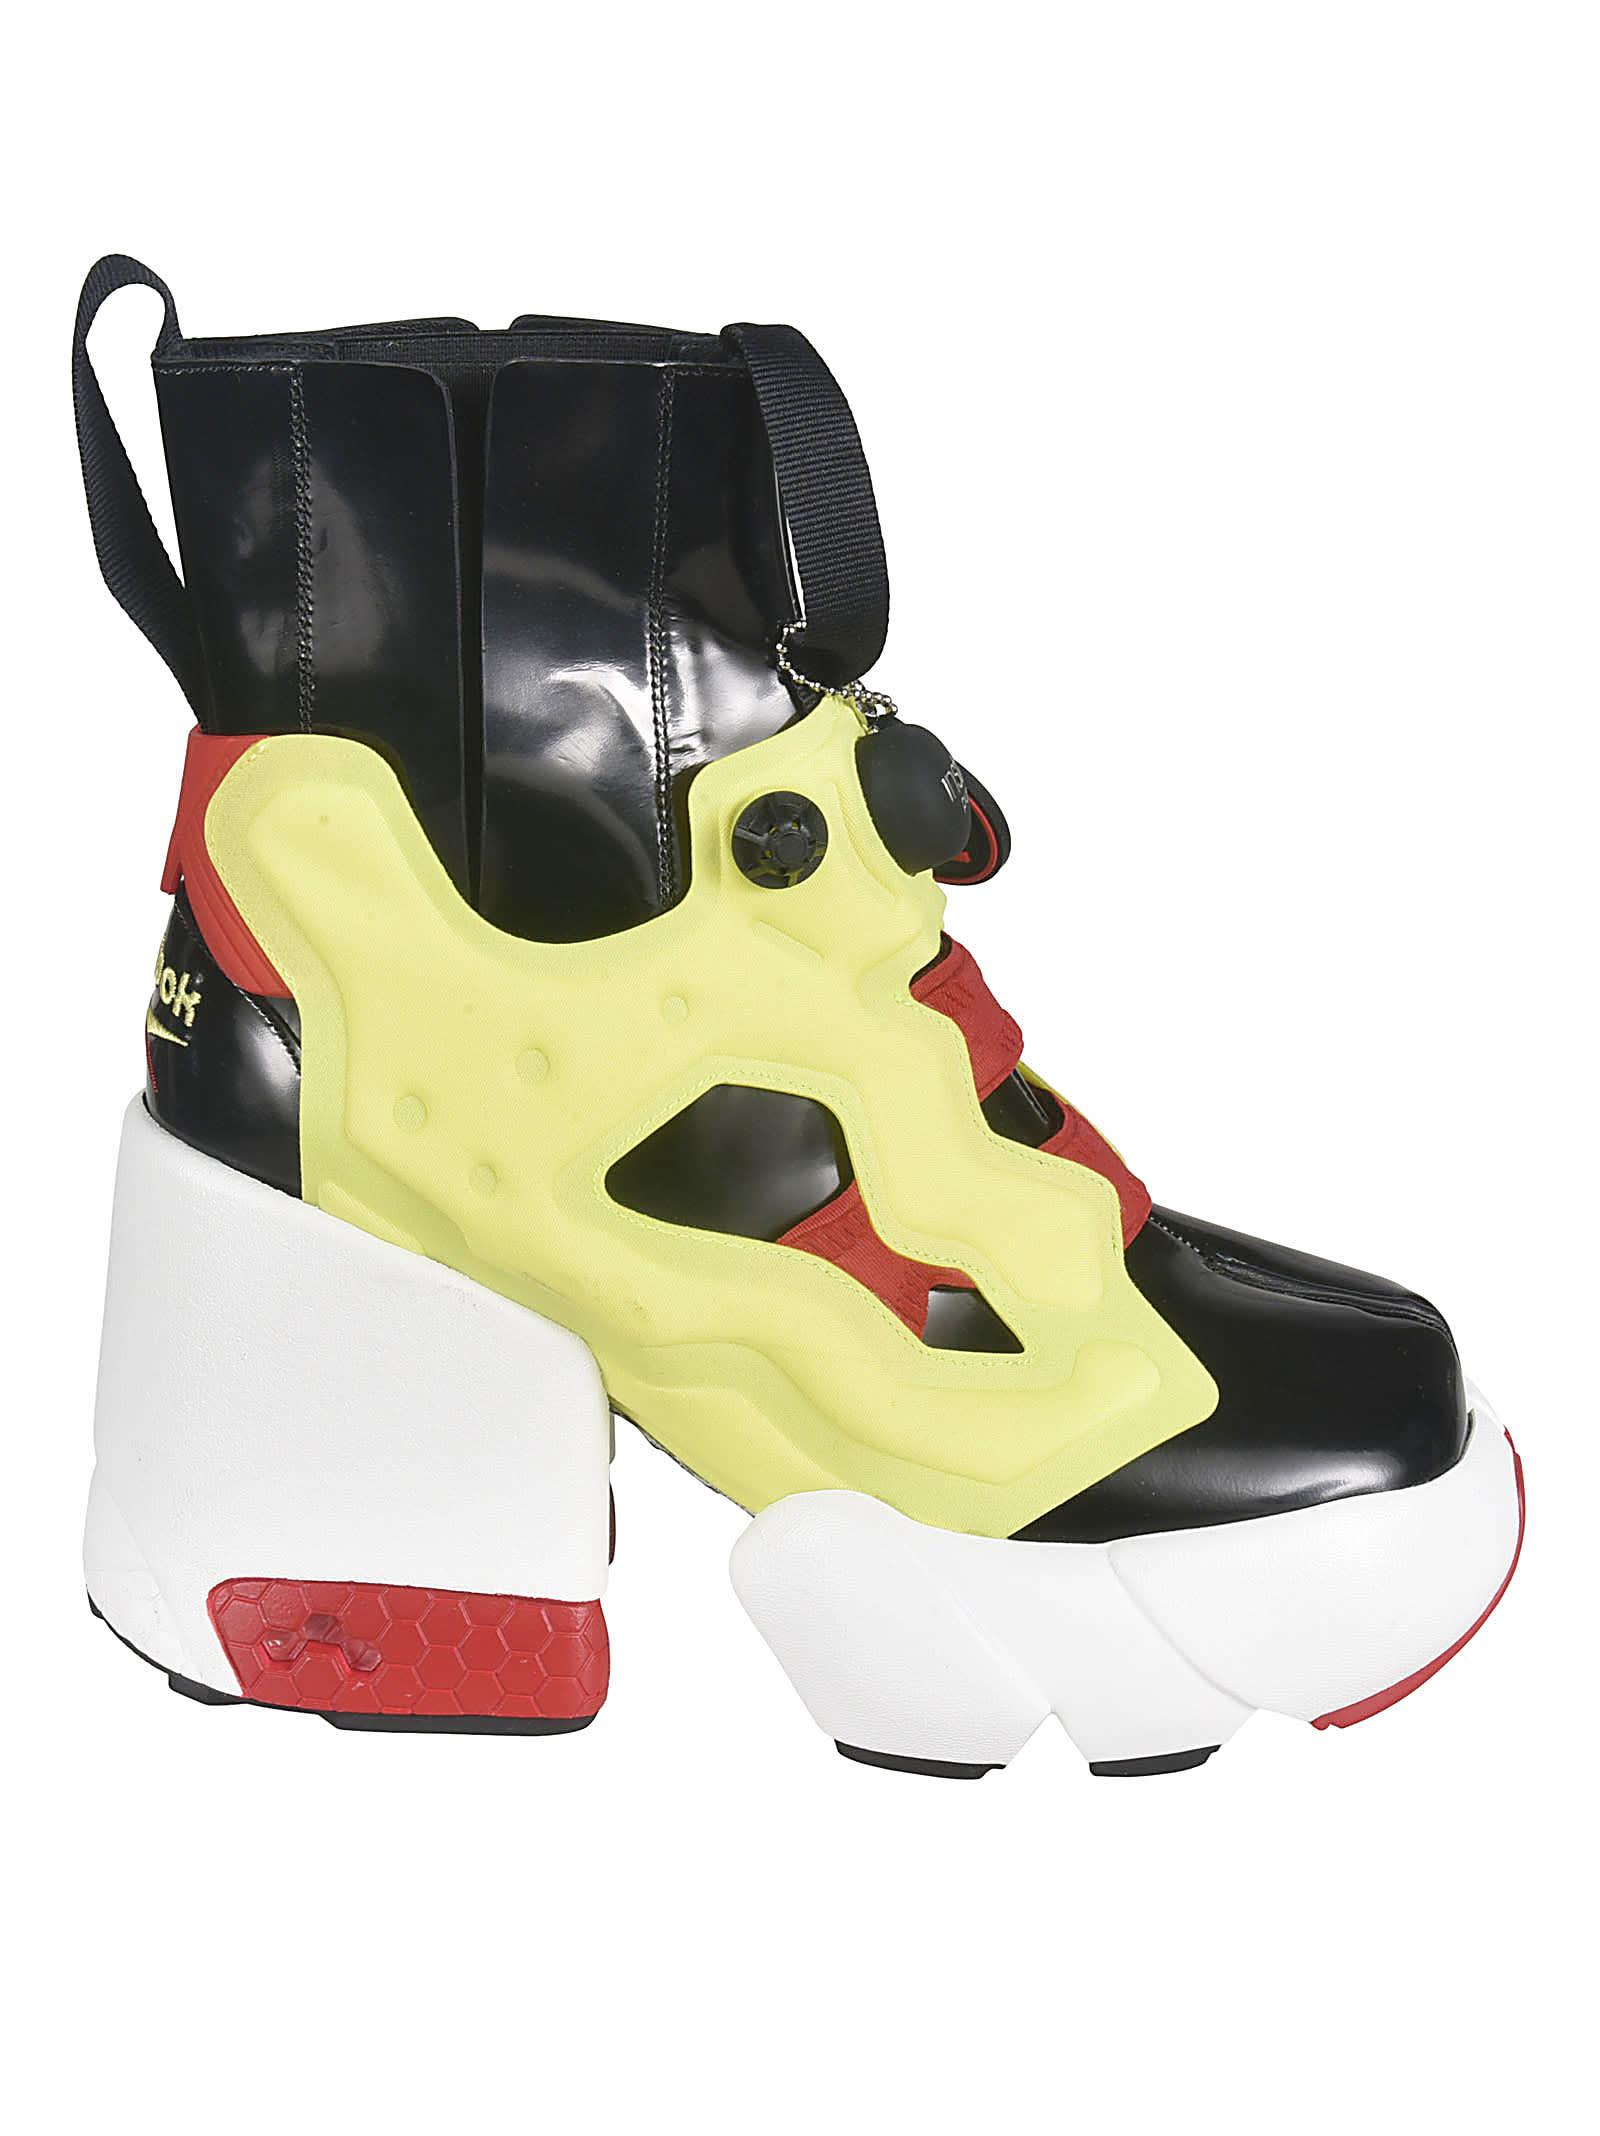 Buy Maison Margiela Tabi Instapump Fury Hi Boots online, shop Maison Margiela shoes with free shipping